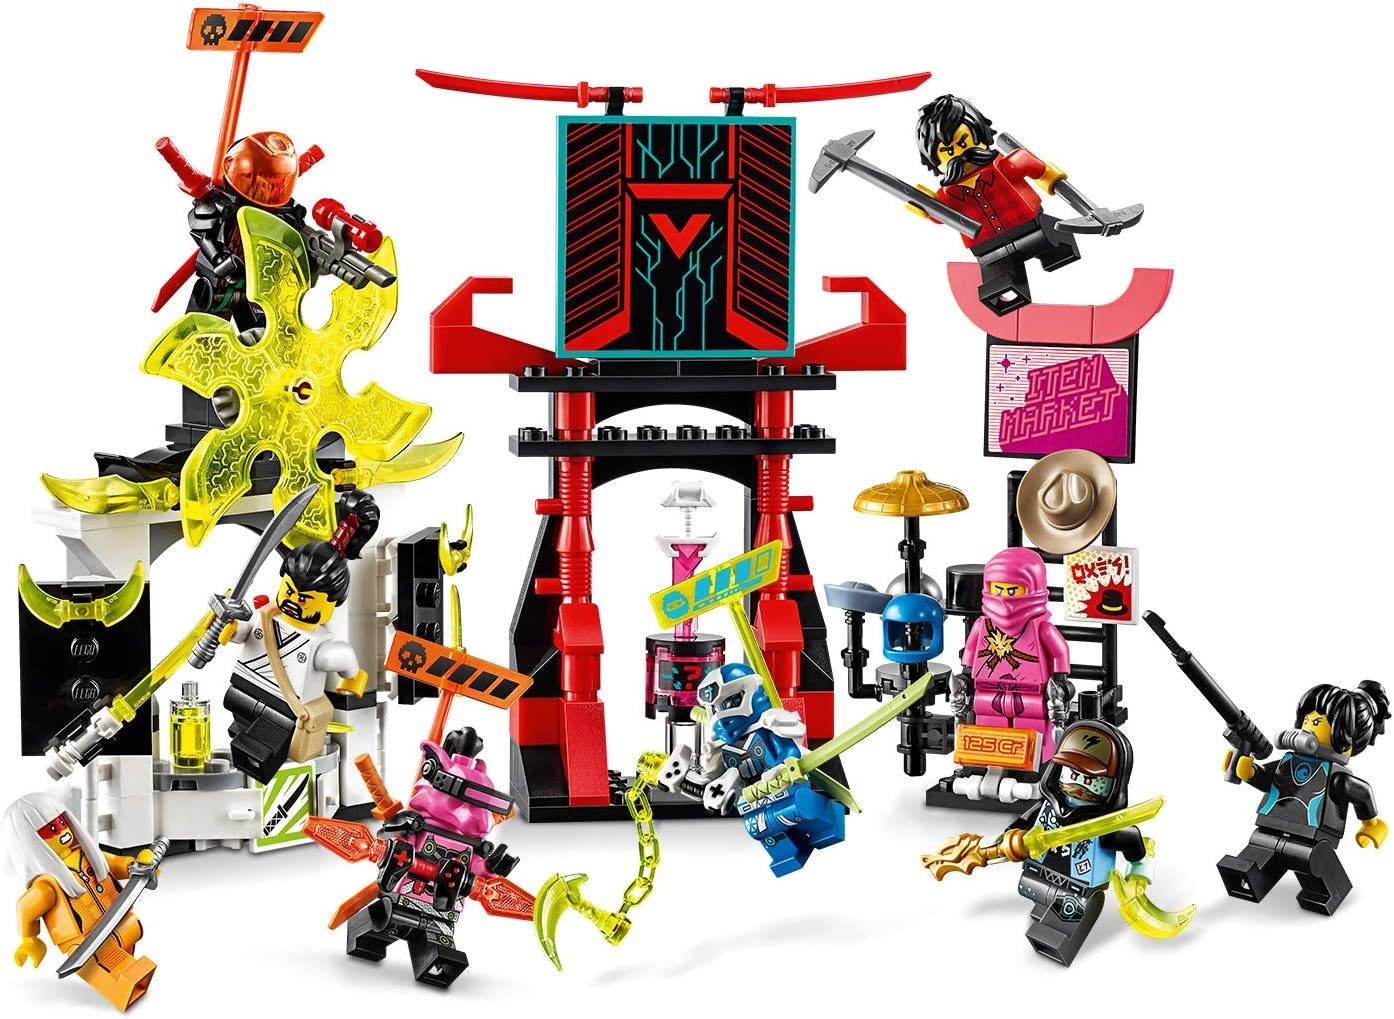 Avatar Pink Zane Un Lego 71708 Ninjago Marktplatz Minifiguren-Set Mit Digi Jay